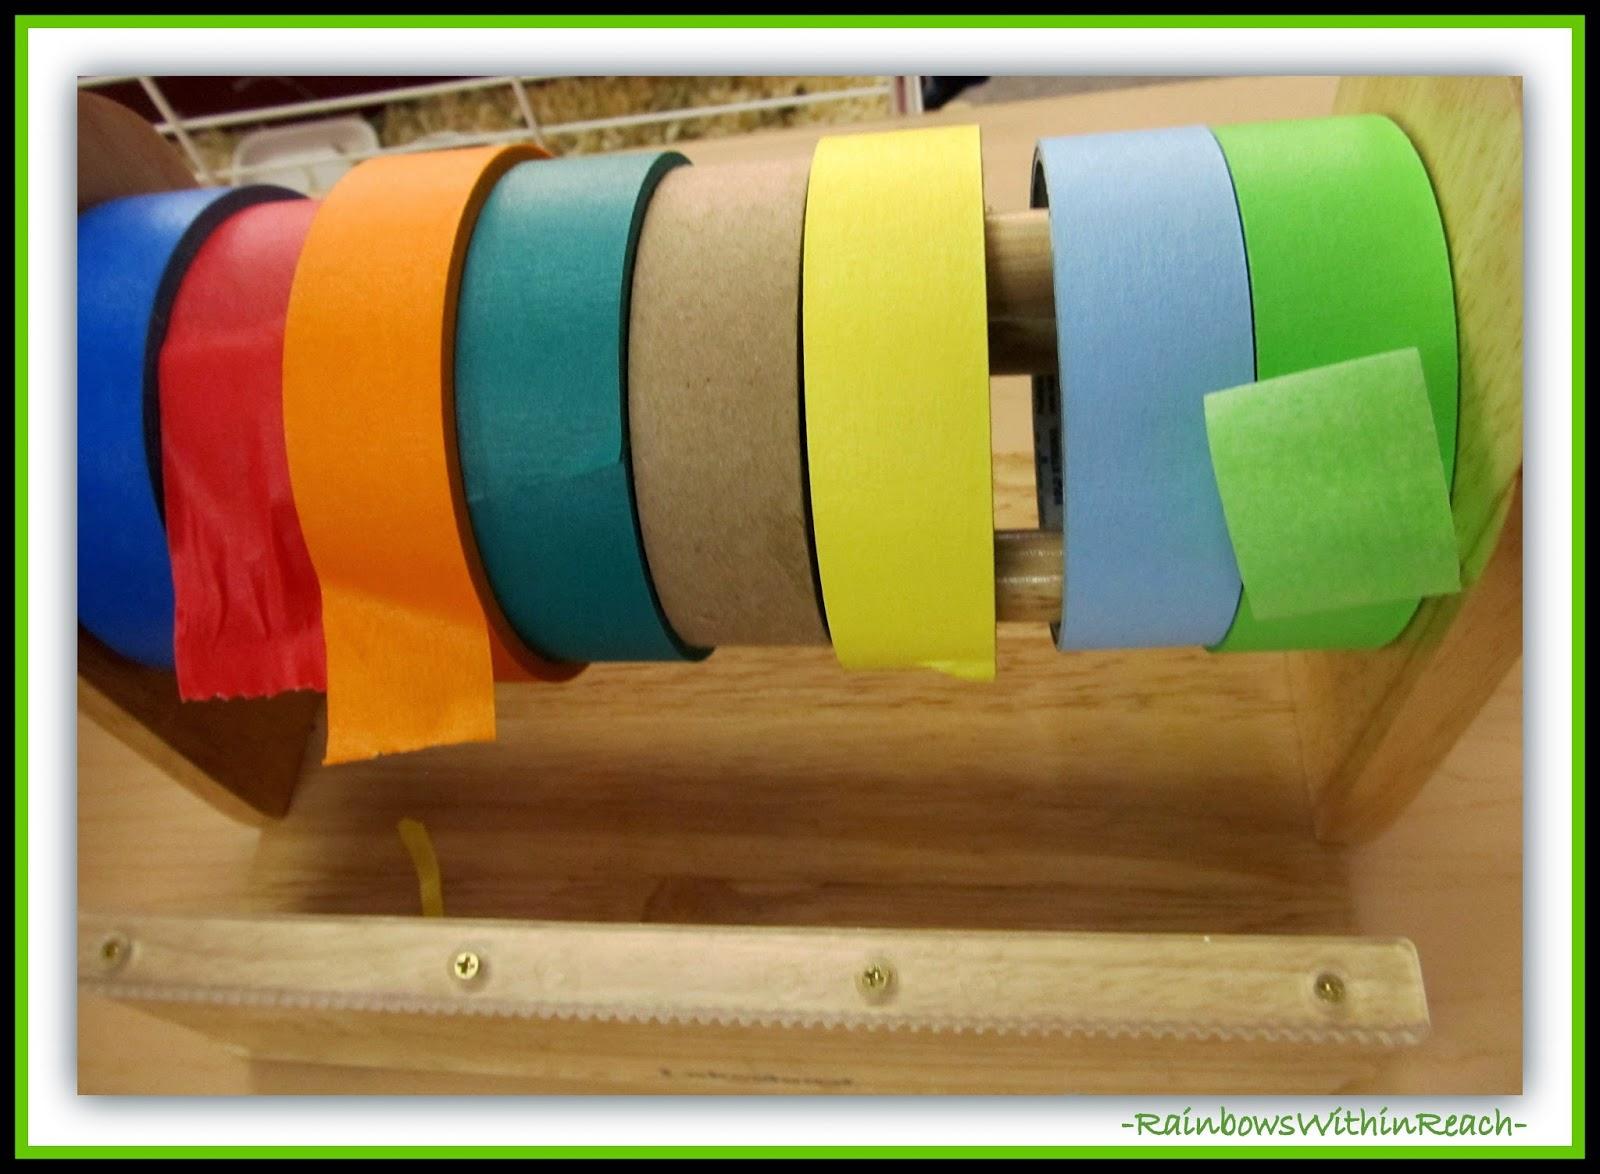 185 Ideas for Classroom Organization: RoundUP at RainbowsWithinReach